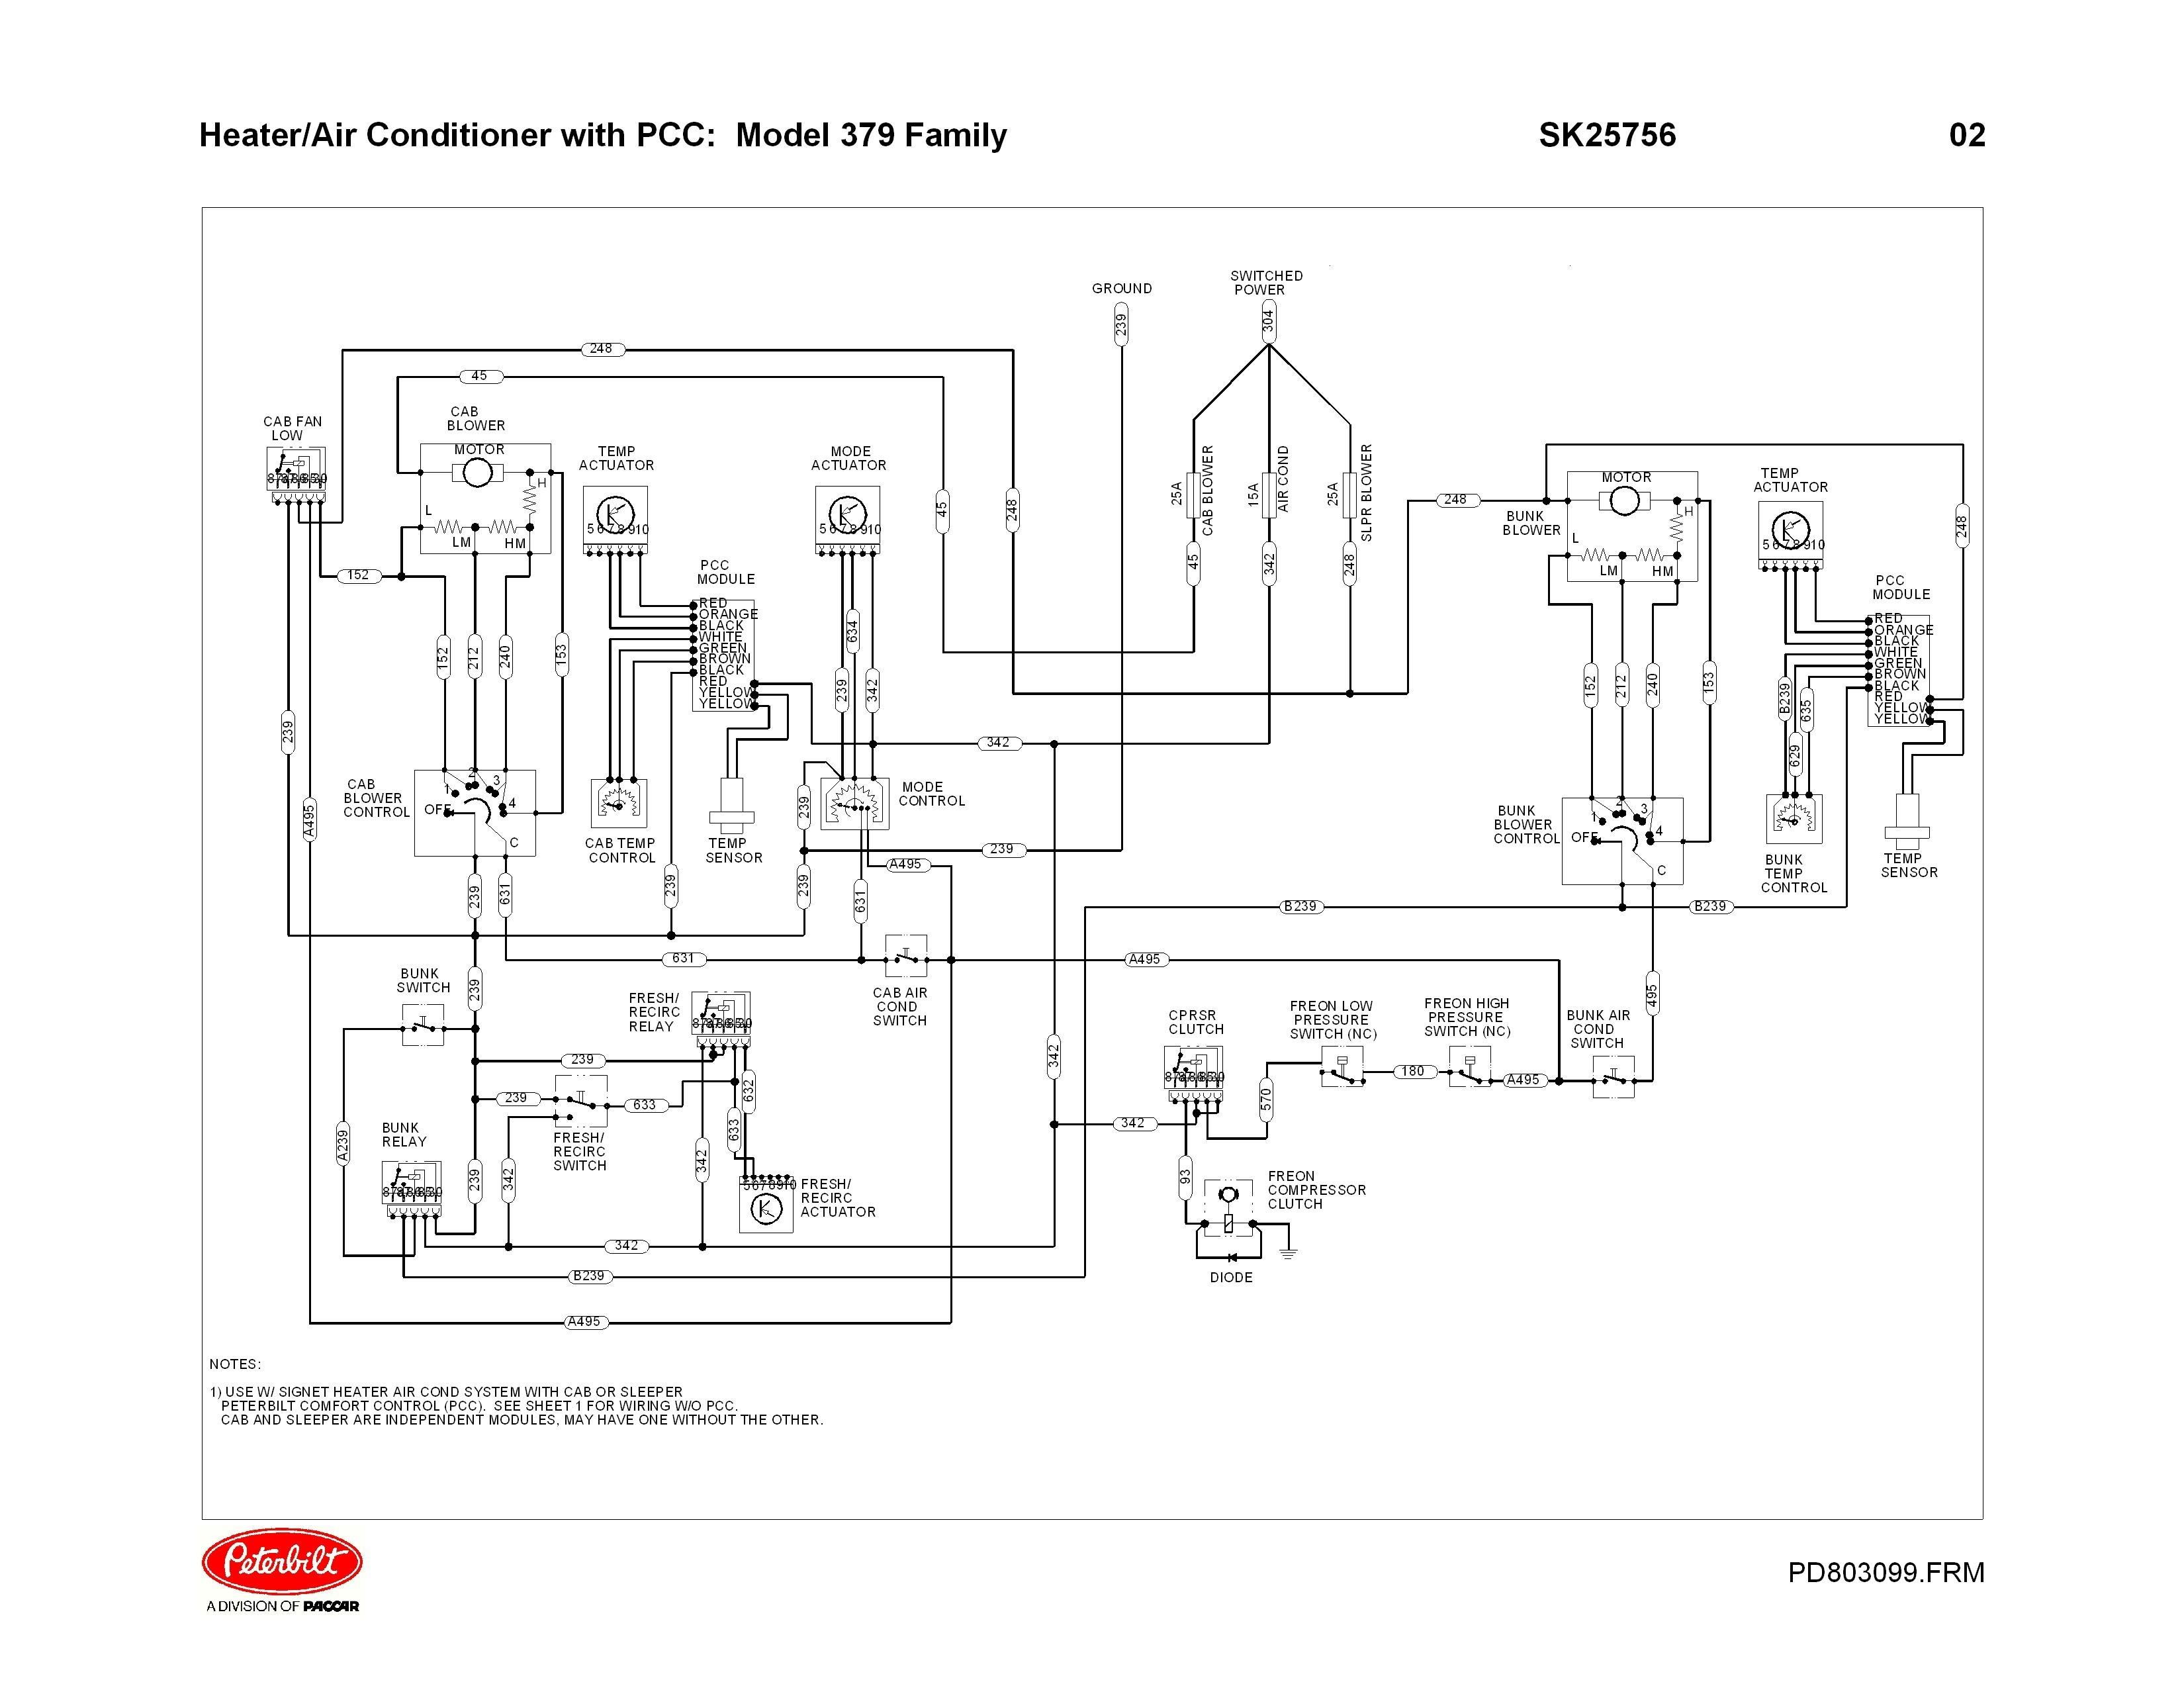 2005 freightliner radio wiring diagram mw 9932  peterbilt wiring diagram 2001 wiring diagram  mw 9932  peterbilt wiring diagram 2001